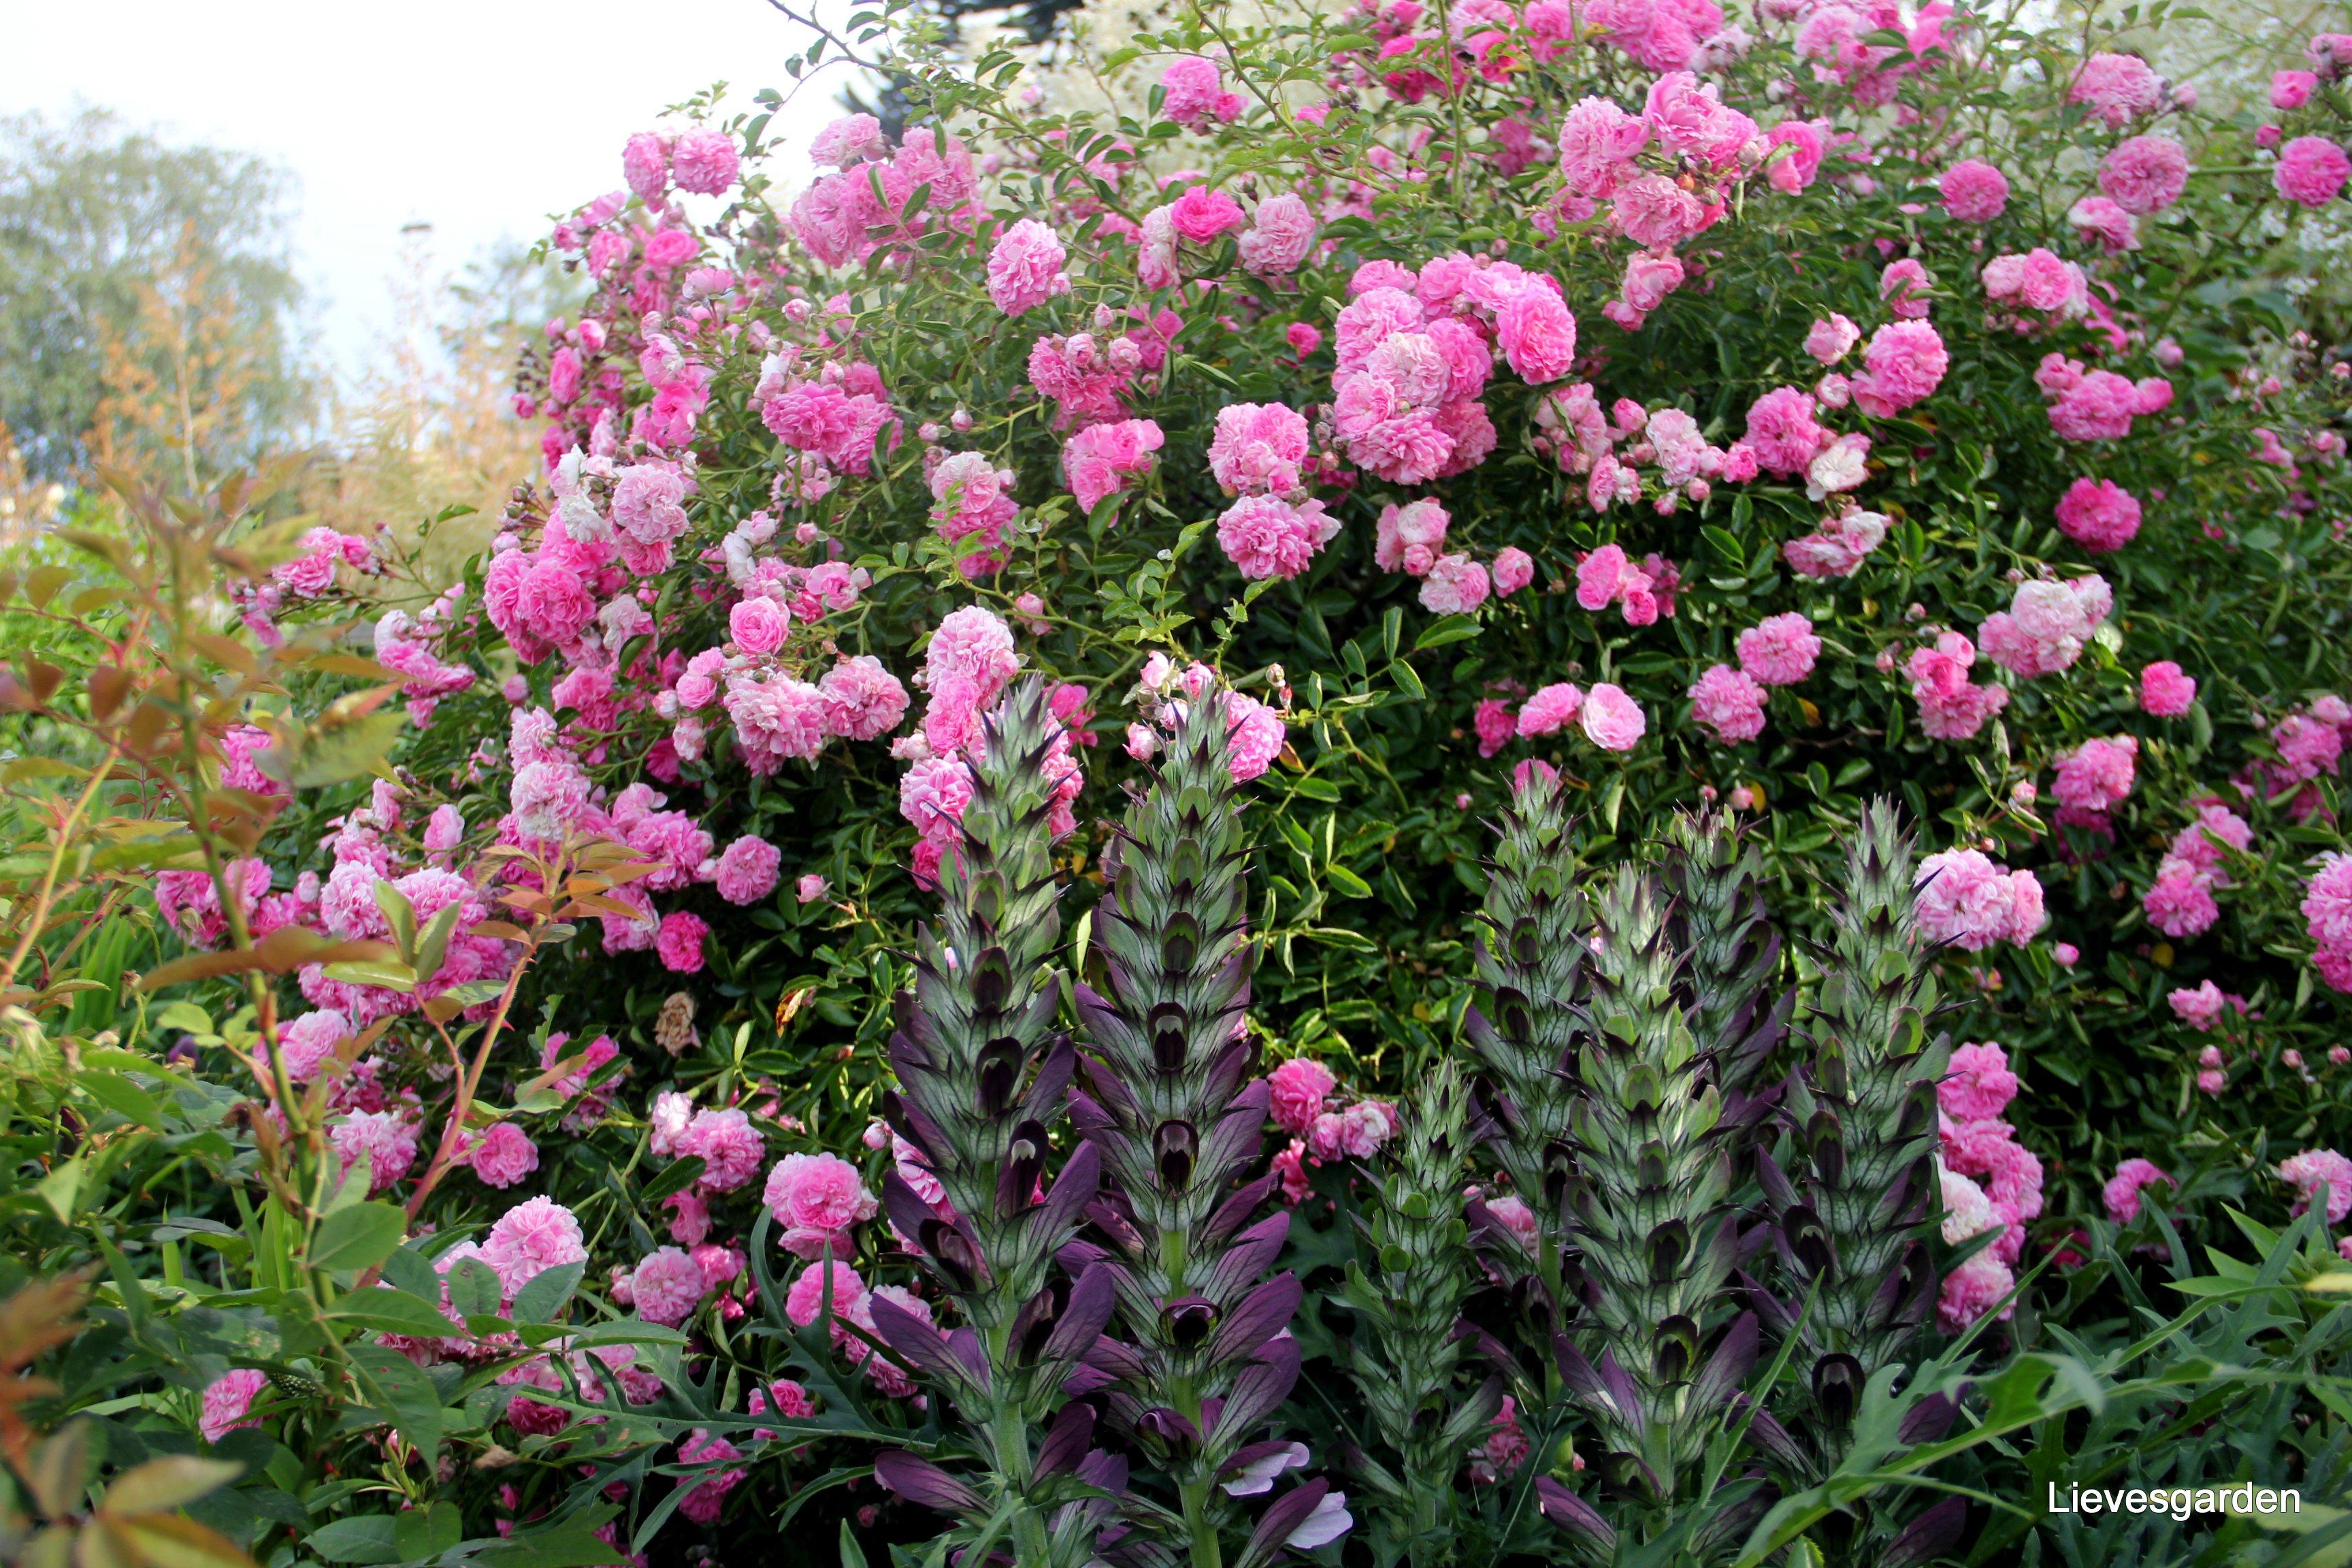 Prachtig plaatje : struikroos met acanthus spinosus